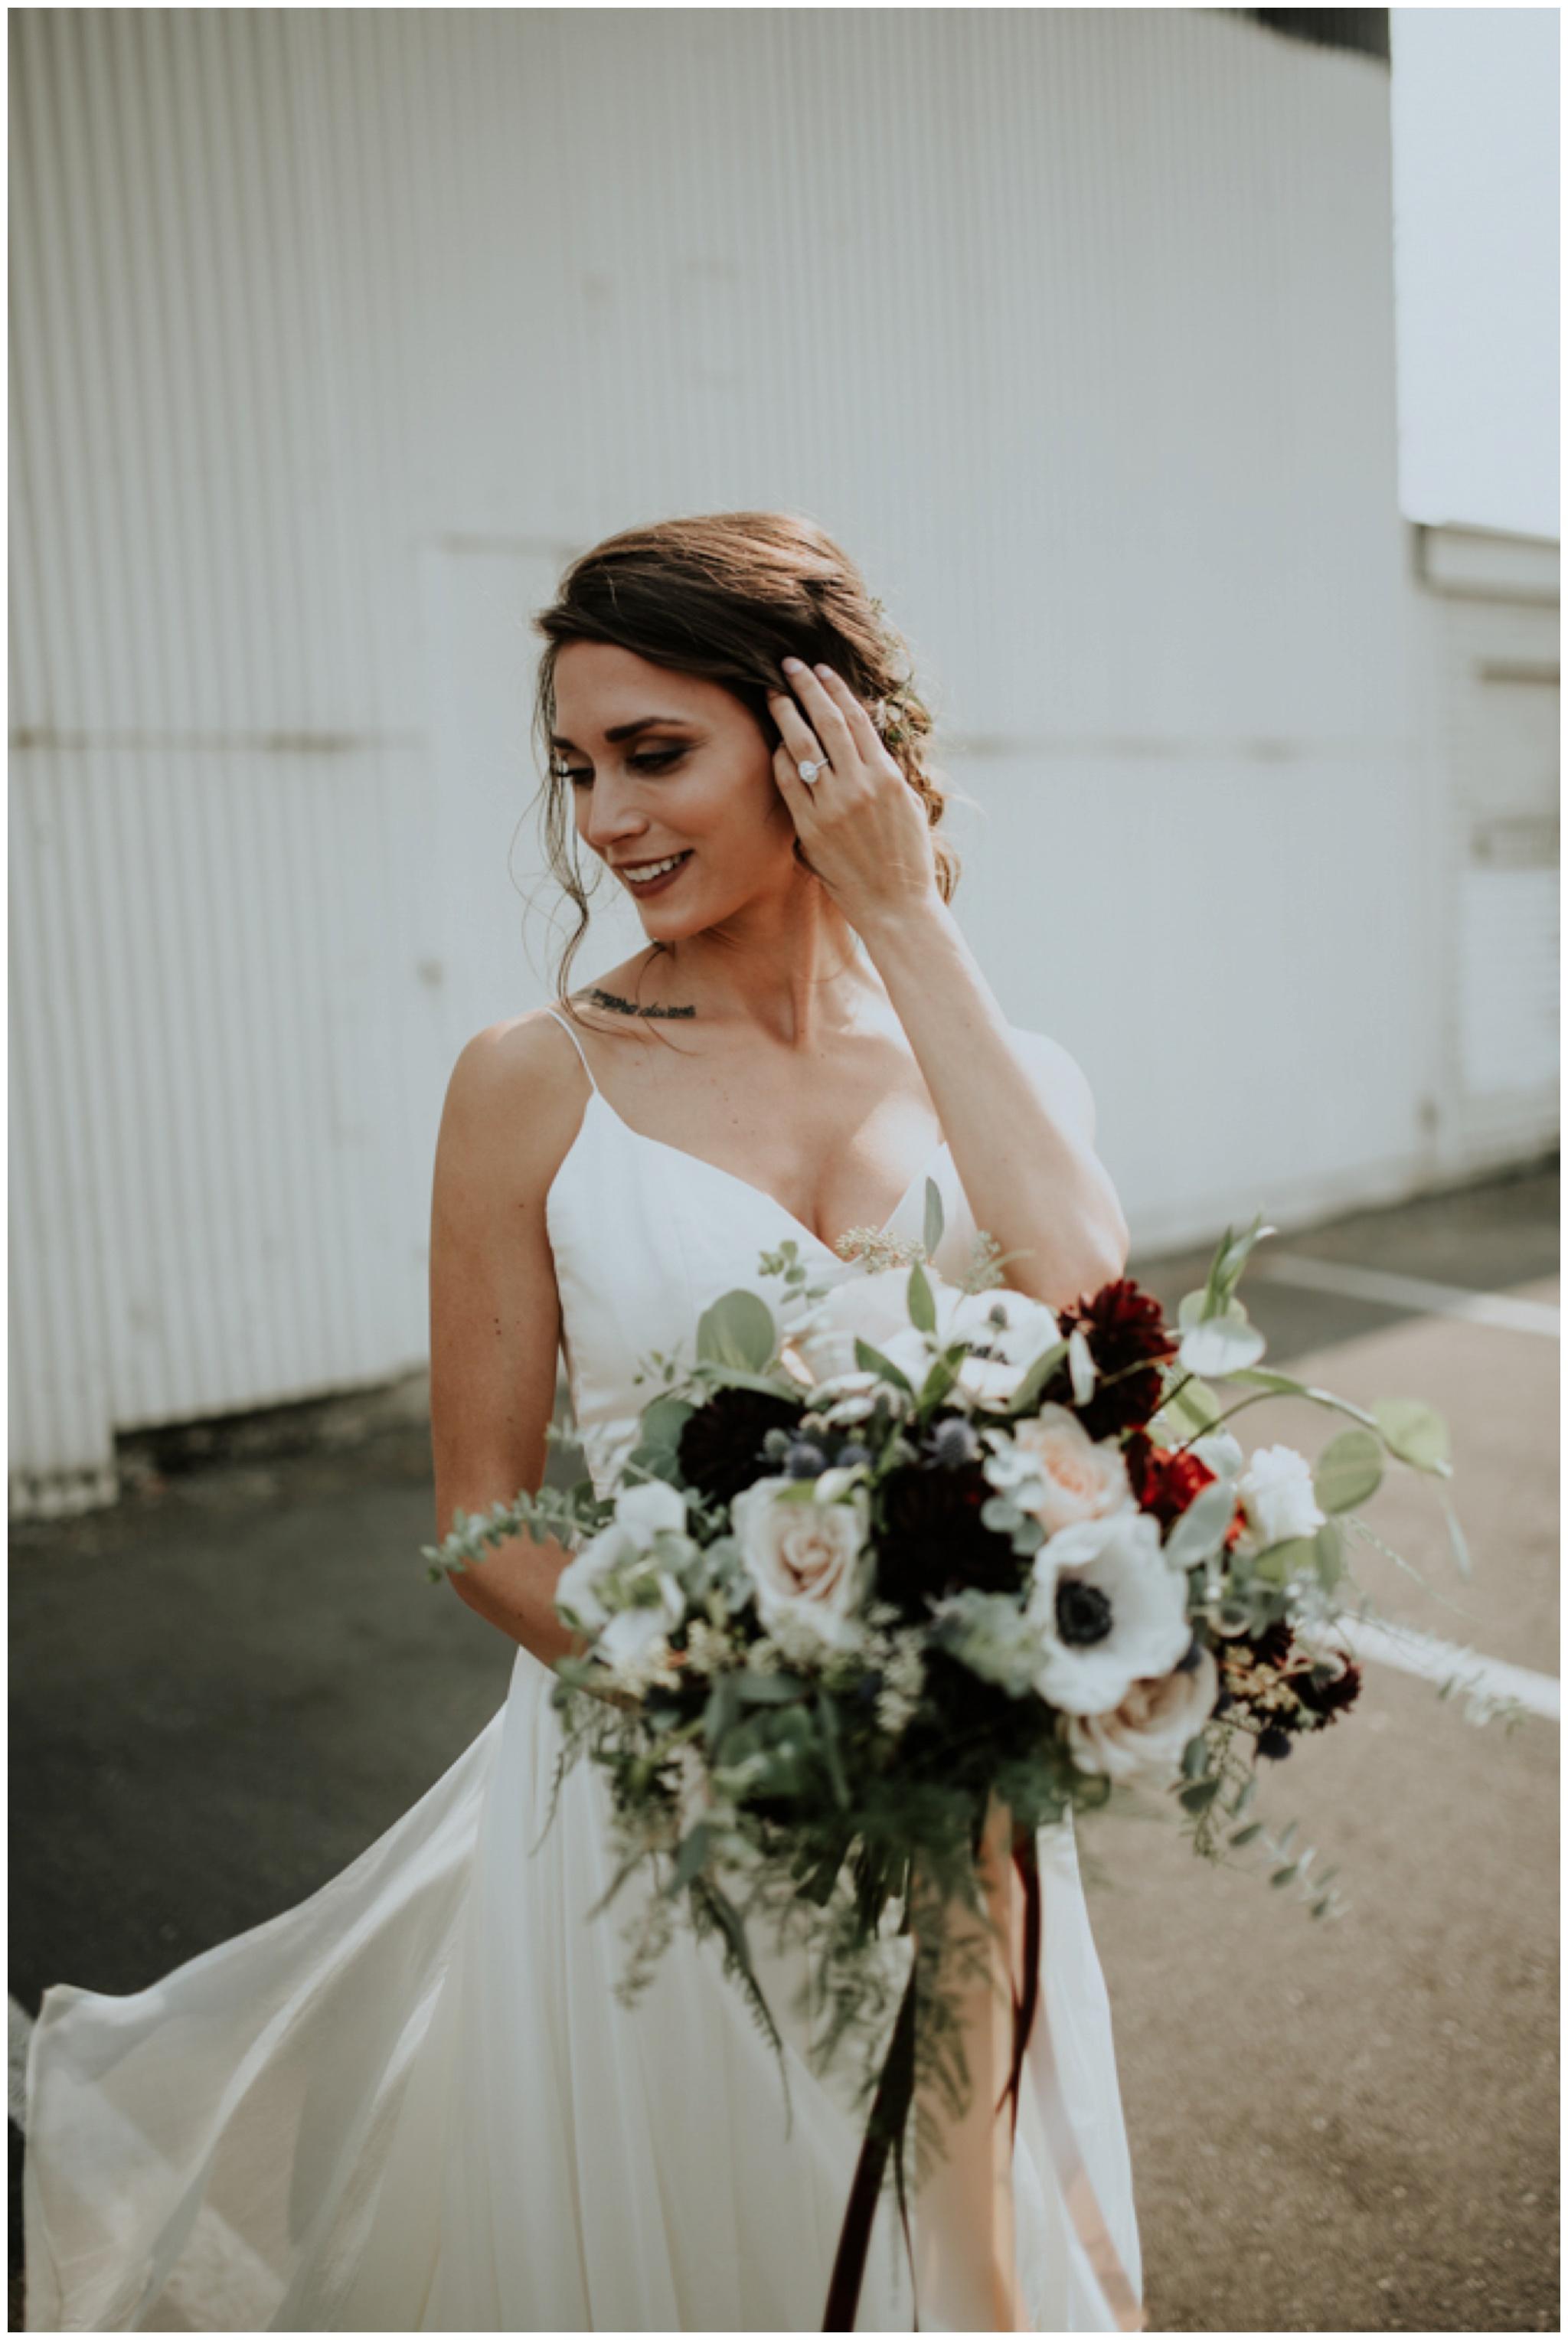 alyssa-keiran-westland-distillery-urban-seattle-wedding-photographer-caitlyn-nikula-89.jpg